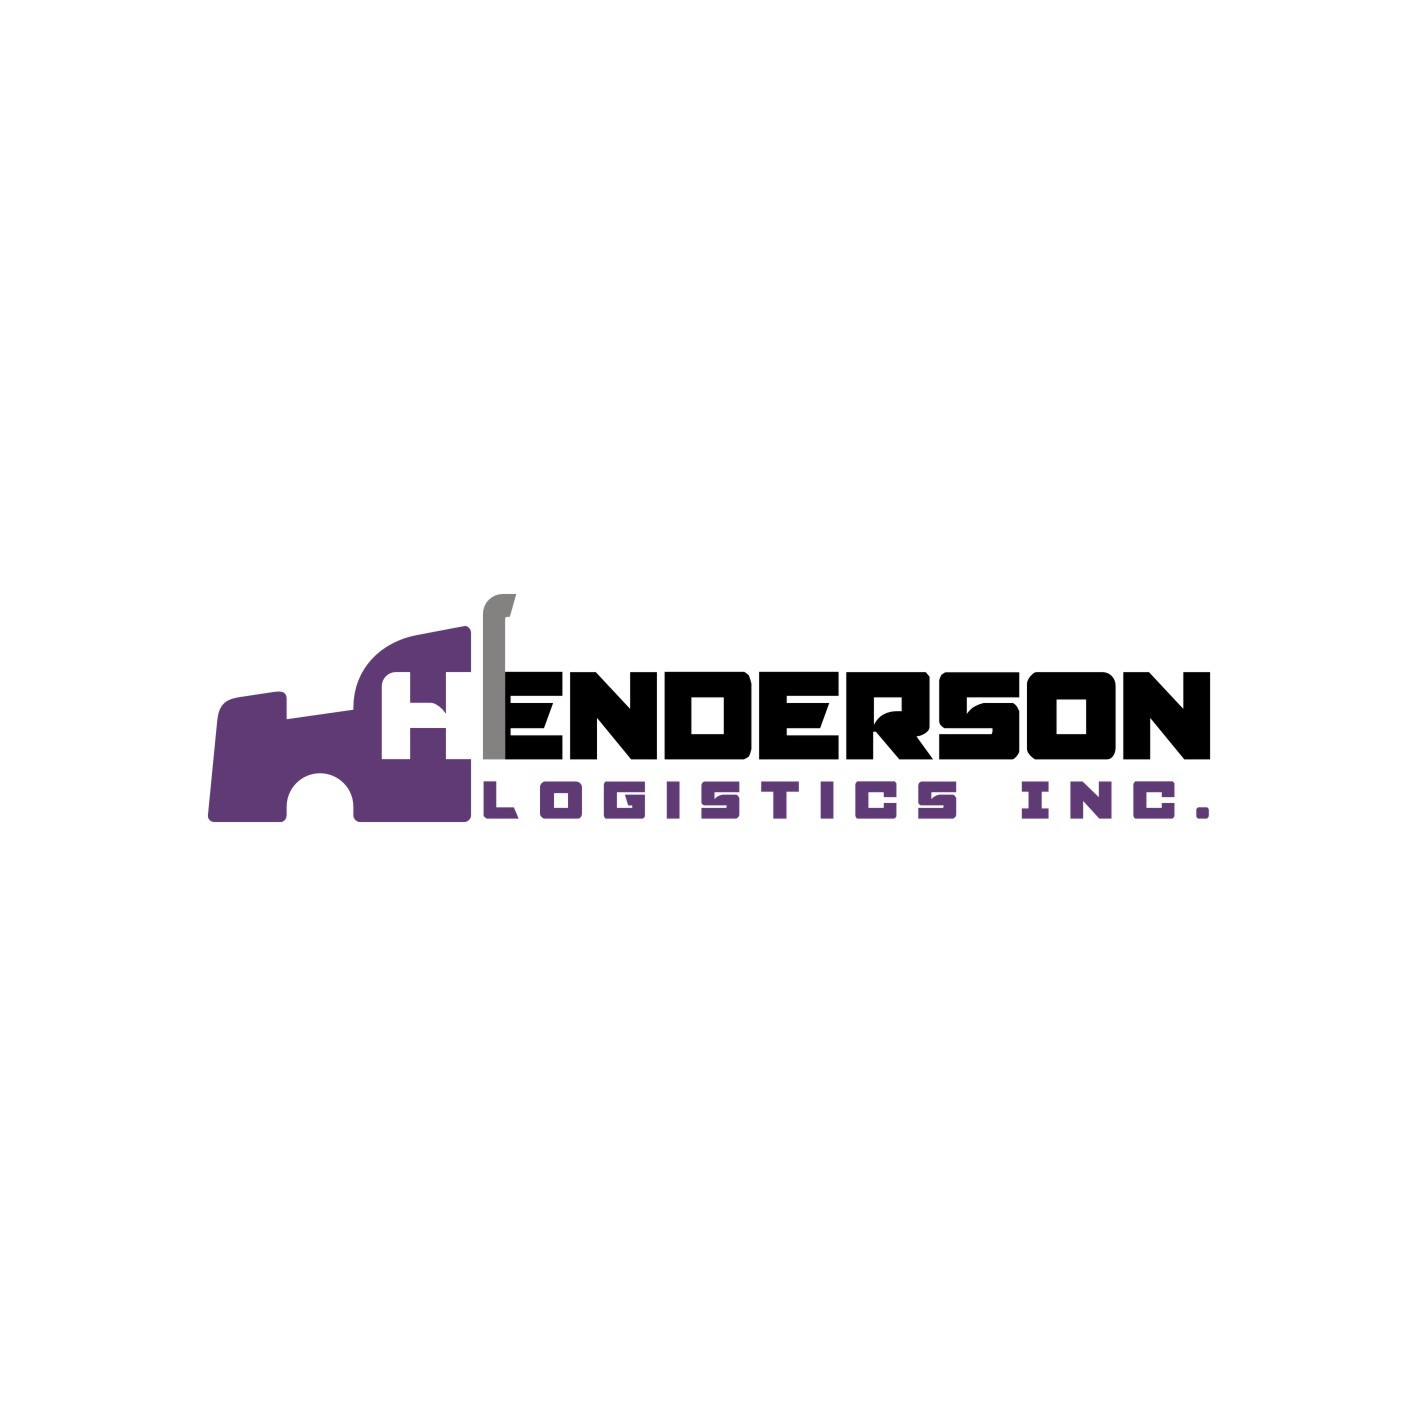 Create a hard-driving logo for Henderson Logistics Inc.